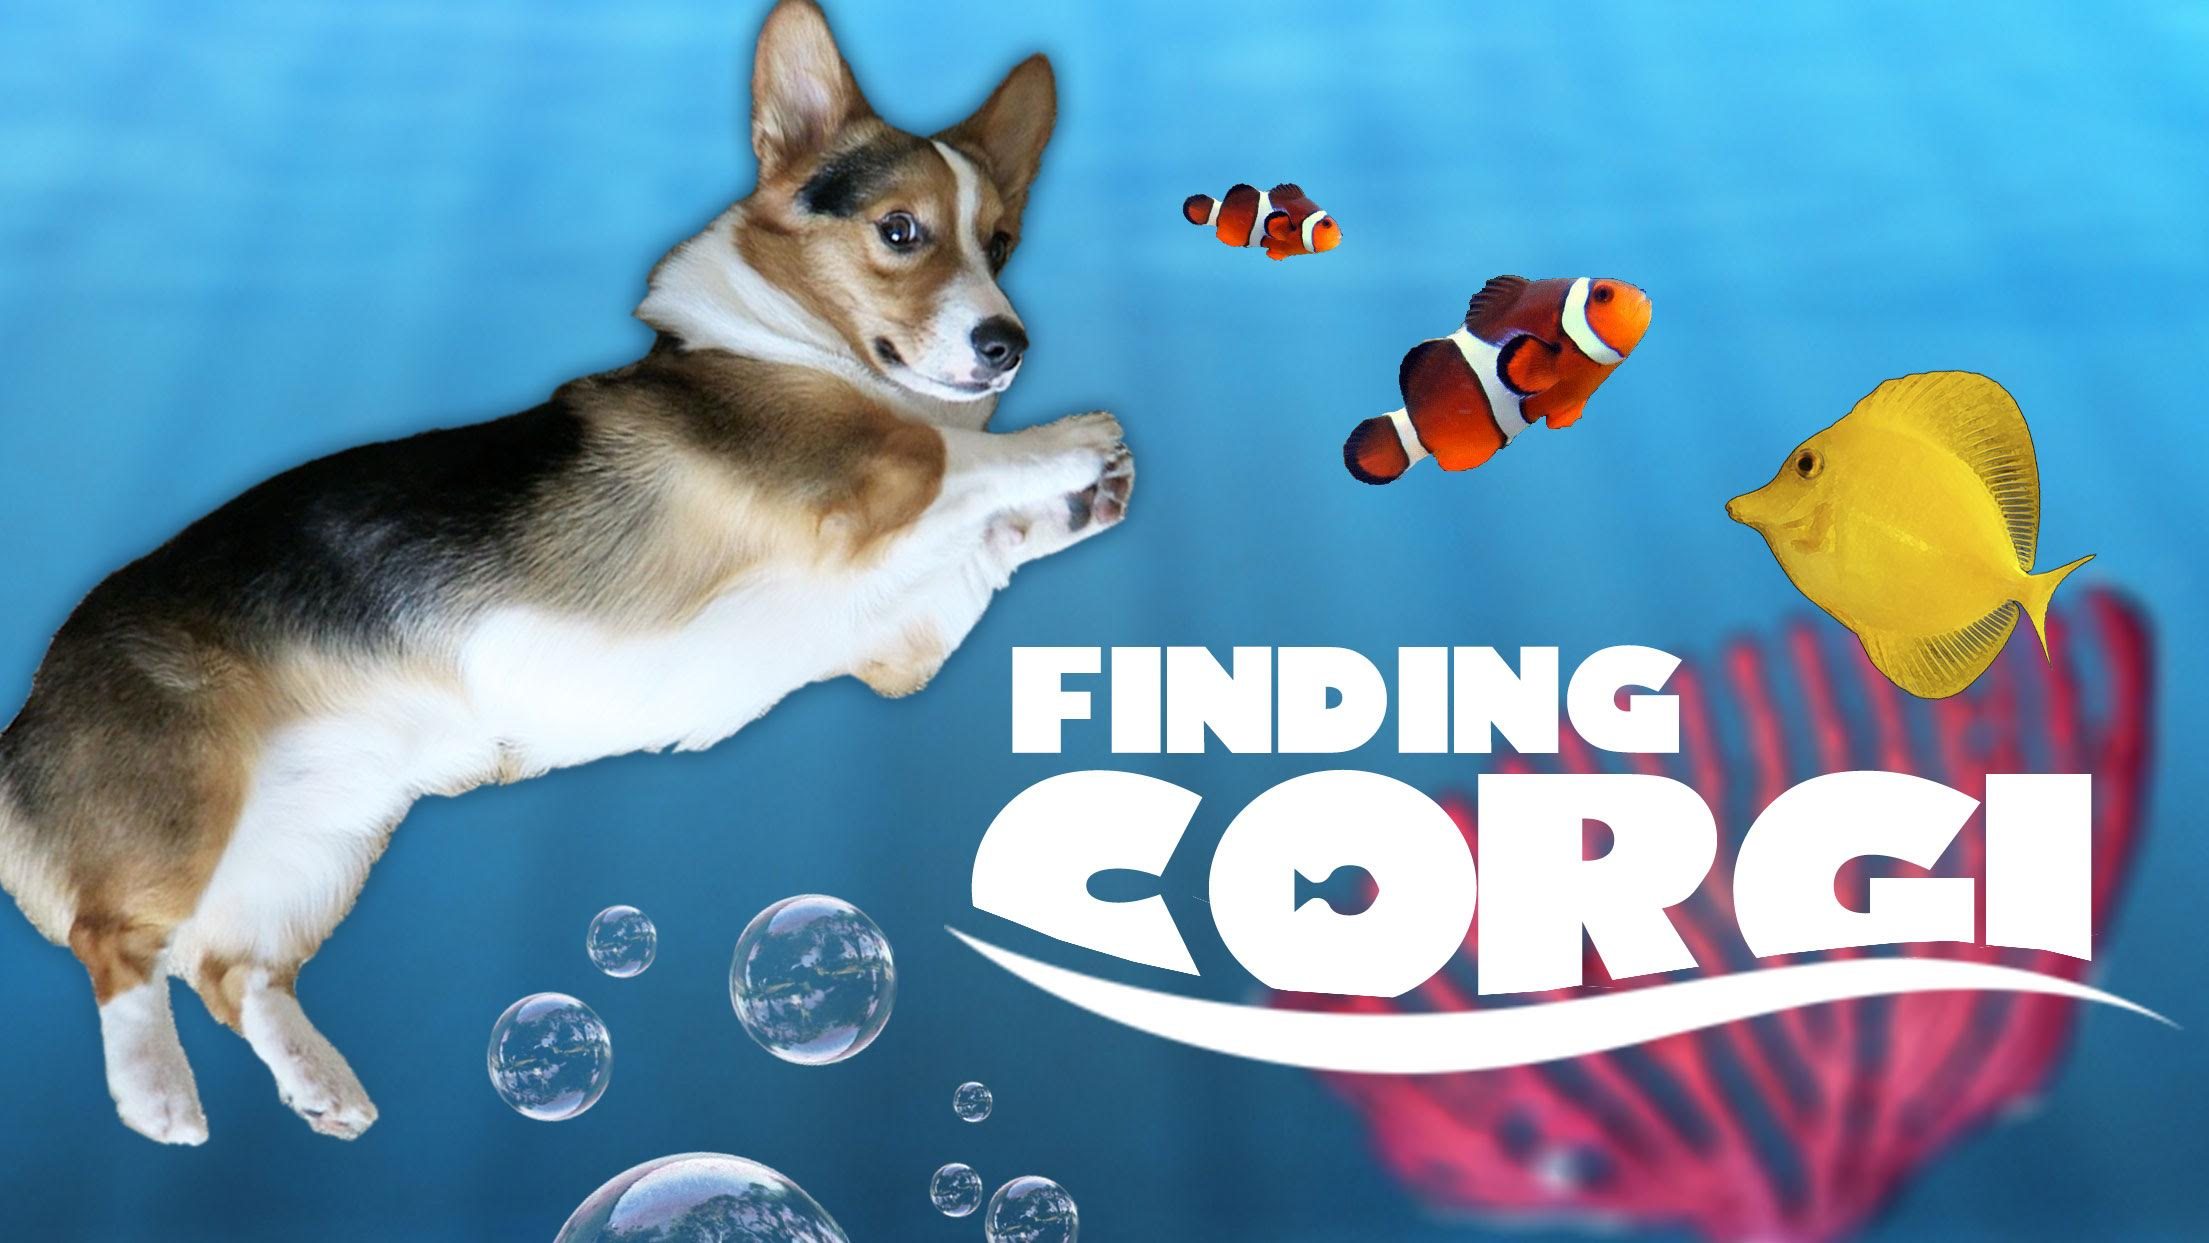 CORGI CARES FOR NEW FISH TANK FRIENDS